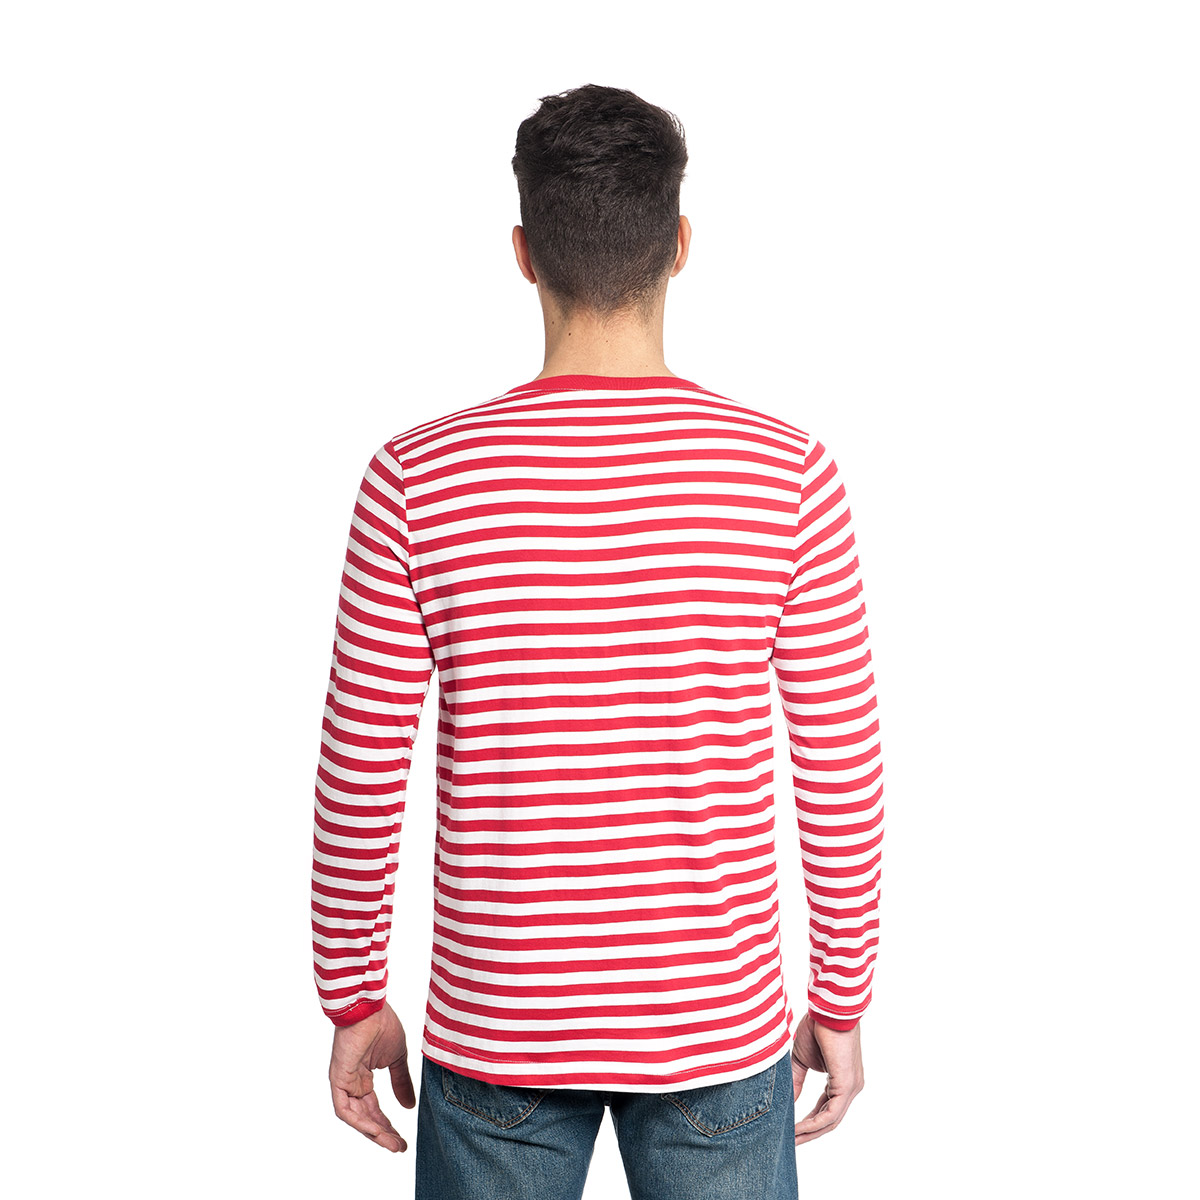 ringelshirt rot wei erwachsene clown pirat matrose kost mplanet. Black Bedroom Furniture Sets. Home Design Ideas